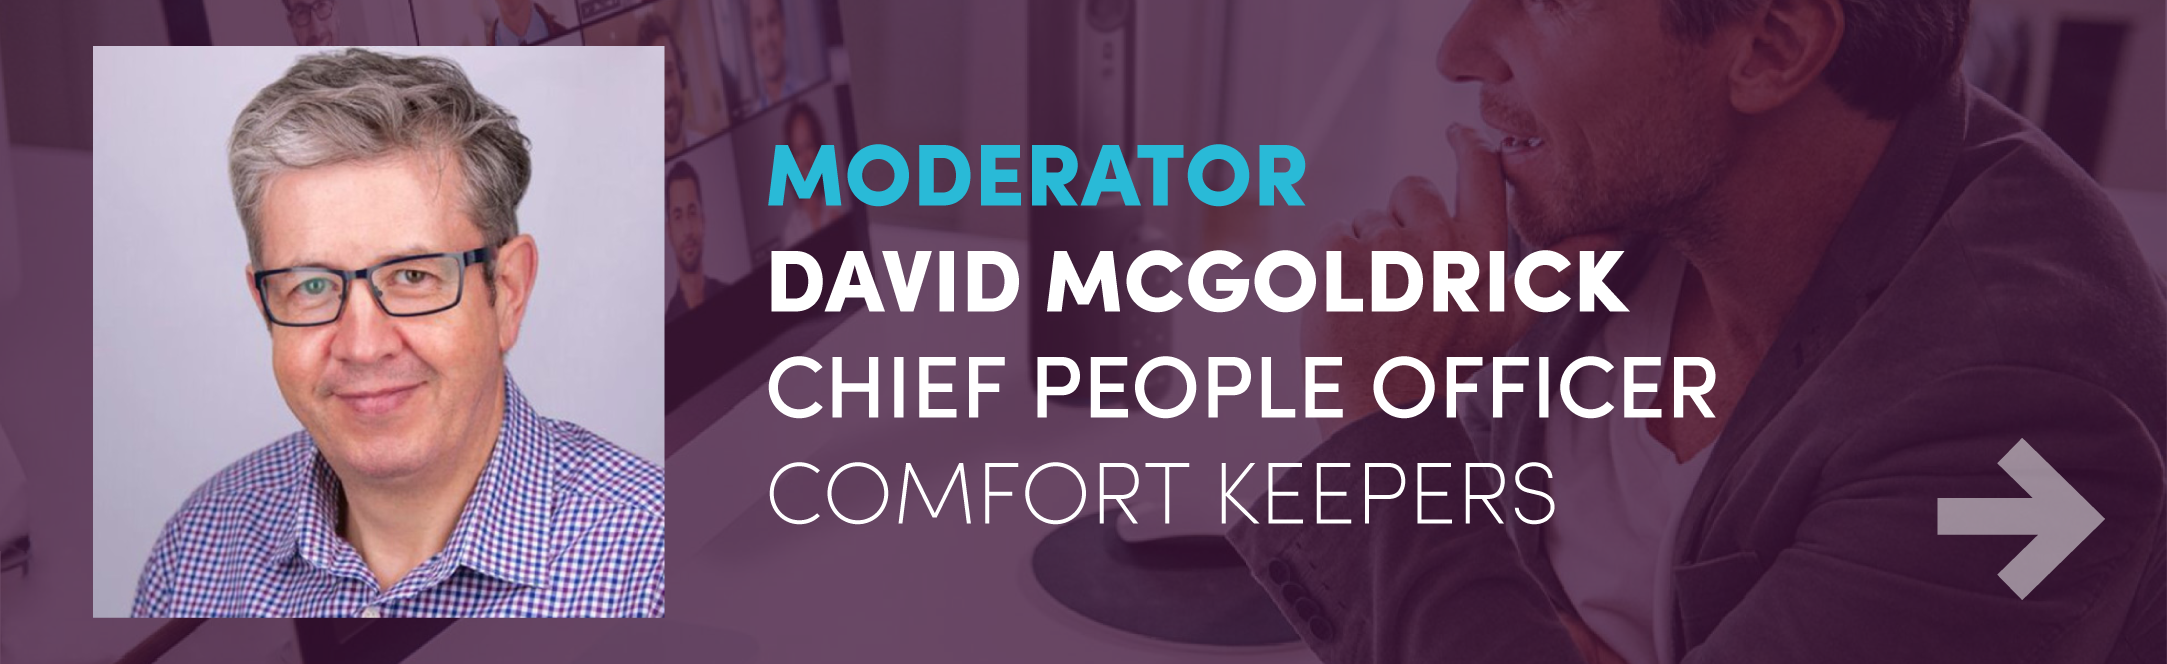 modrator david mcgoldrick chief people officer